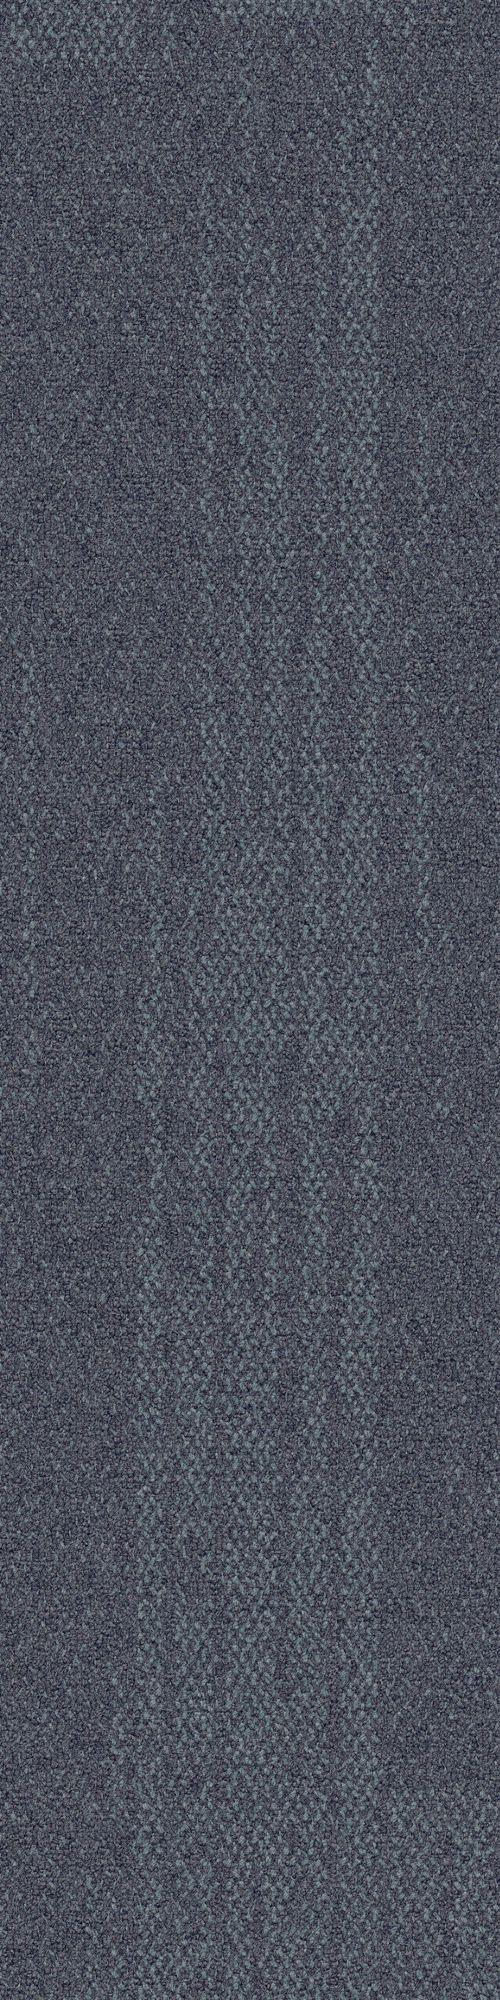 Interface carpet tile: Riverside Color name: Lagoon